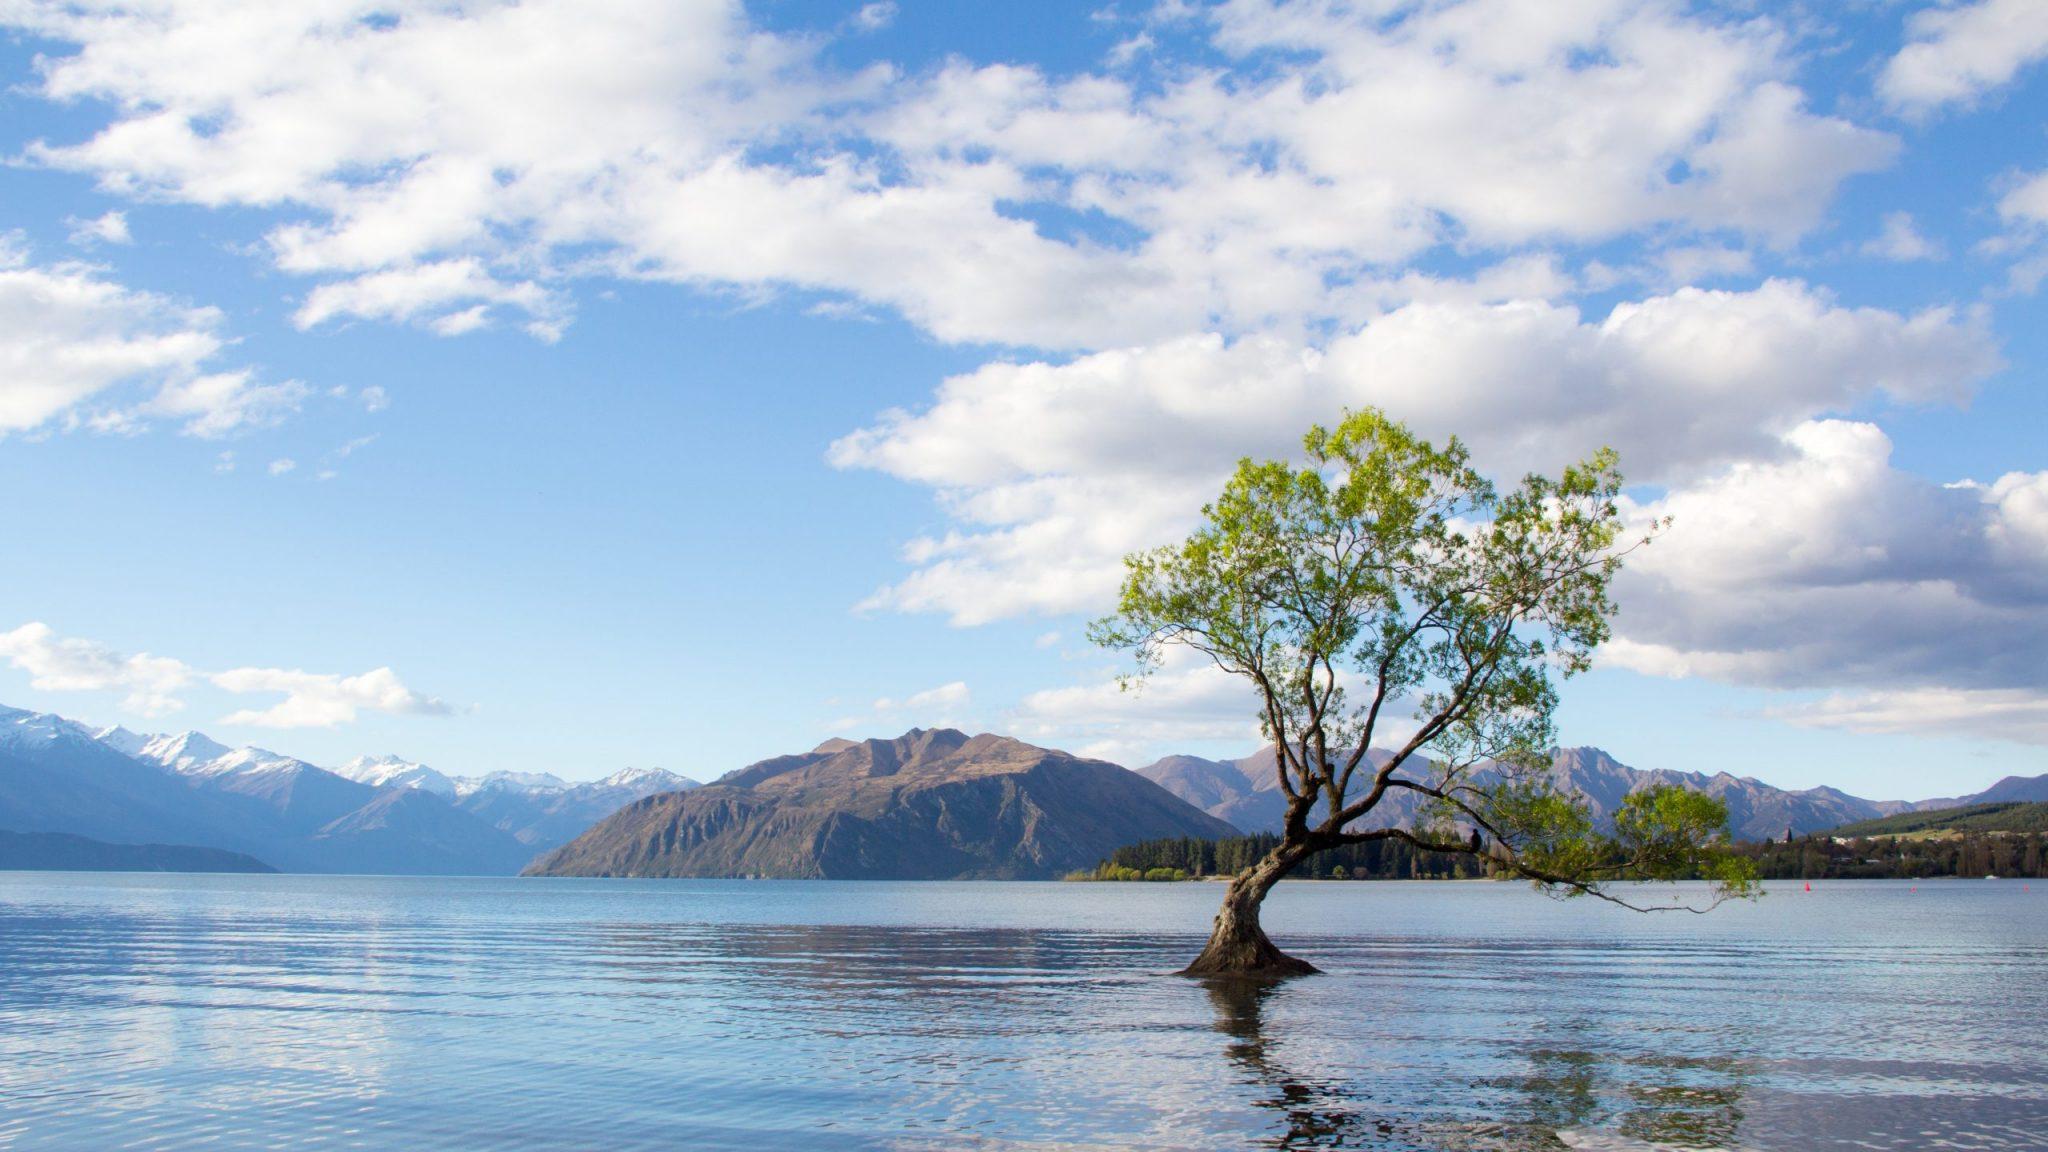 photo-of-tree-on-lake-2463951